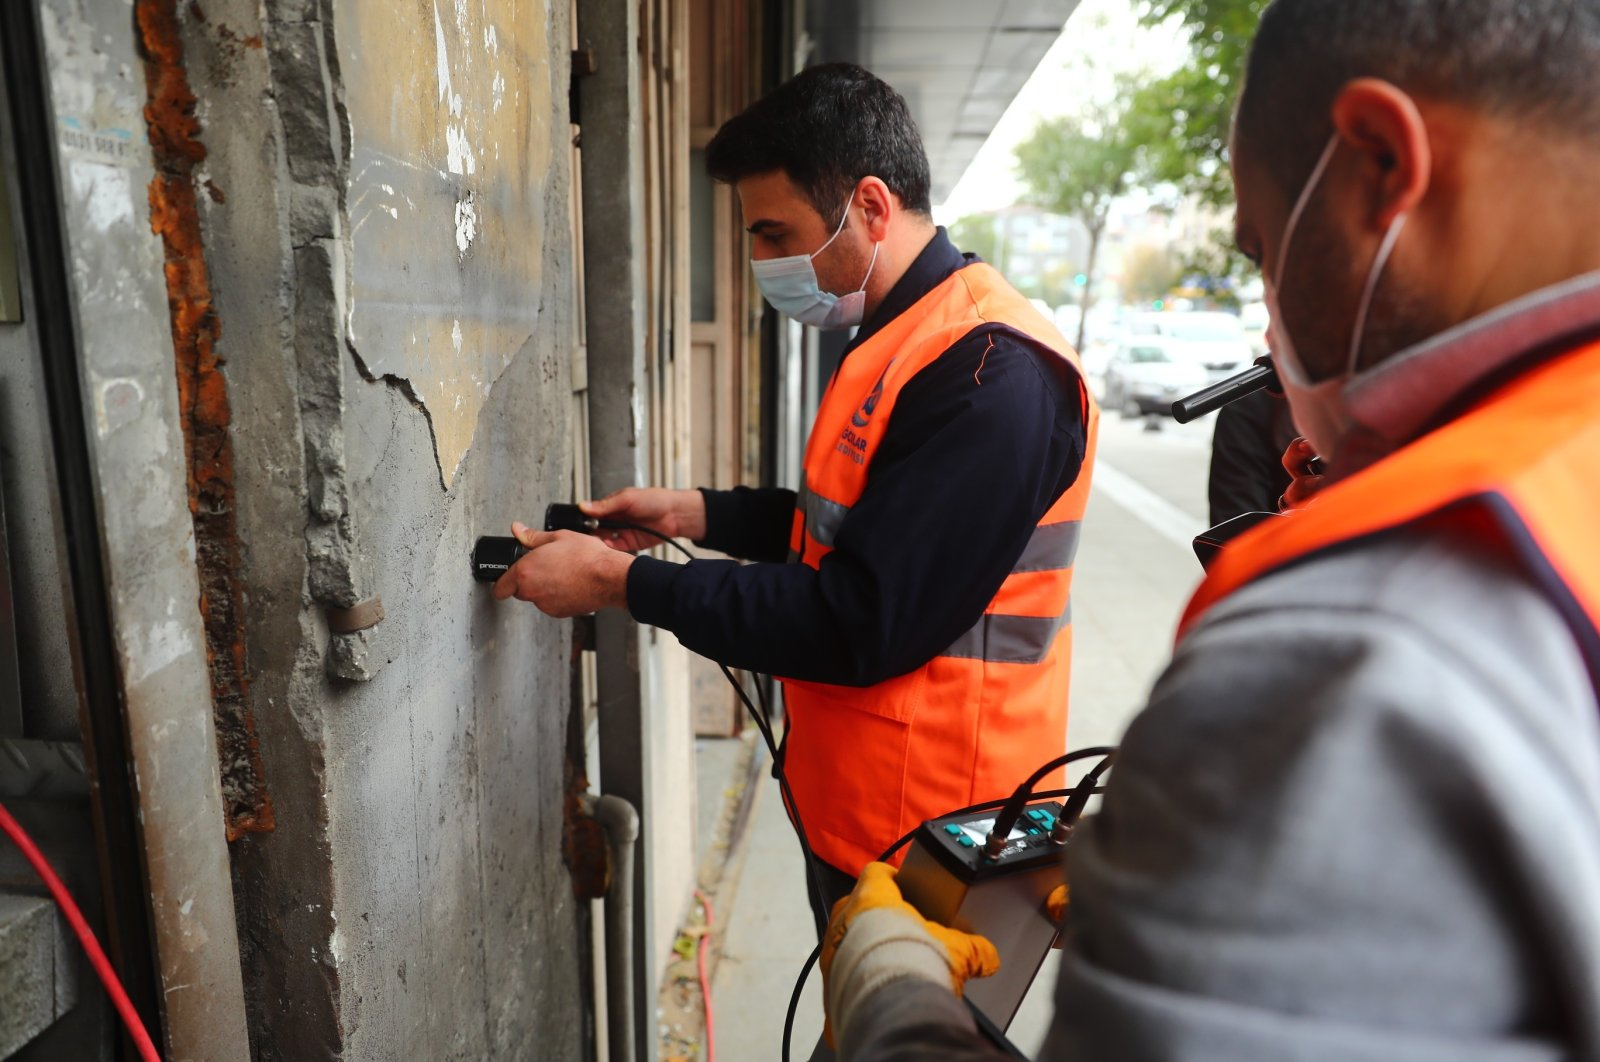 Workers run an endurance test against earthquakes at a building in Bağcılar district, in Istanbul, Turkey, Nov. 3, 2020. (İHA Photo)